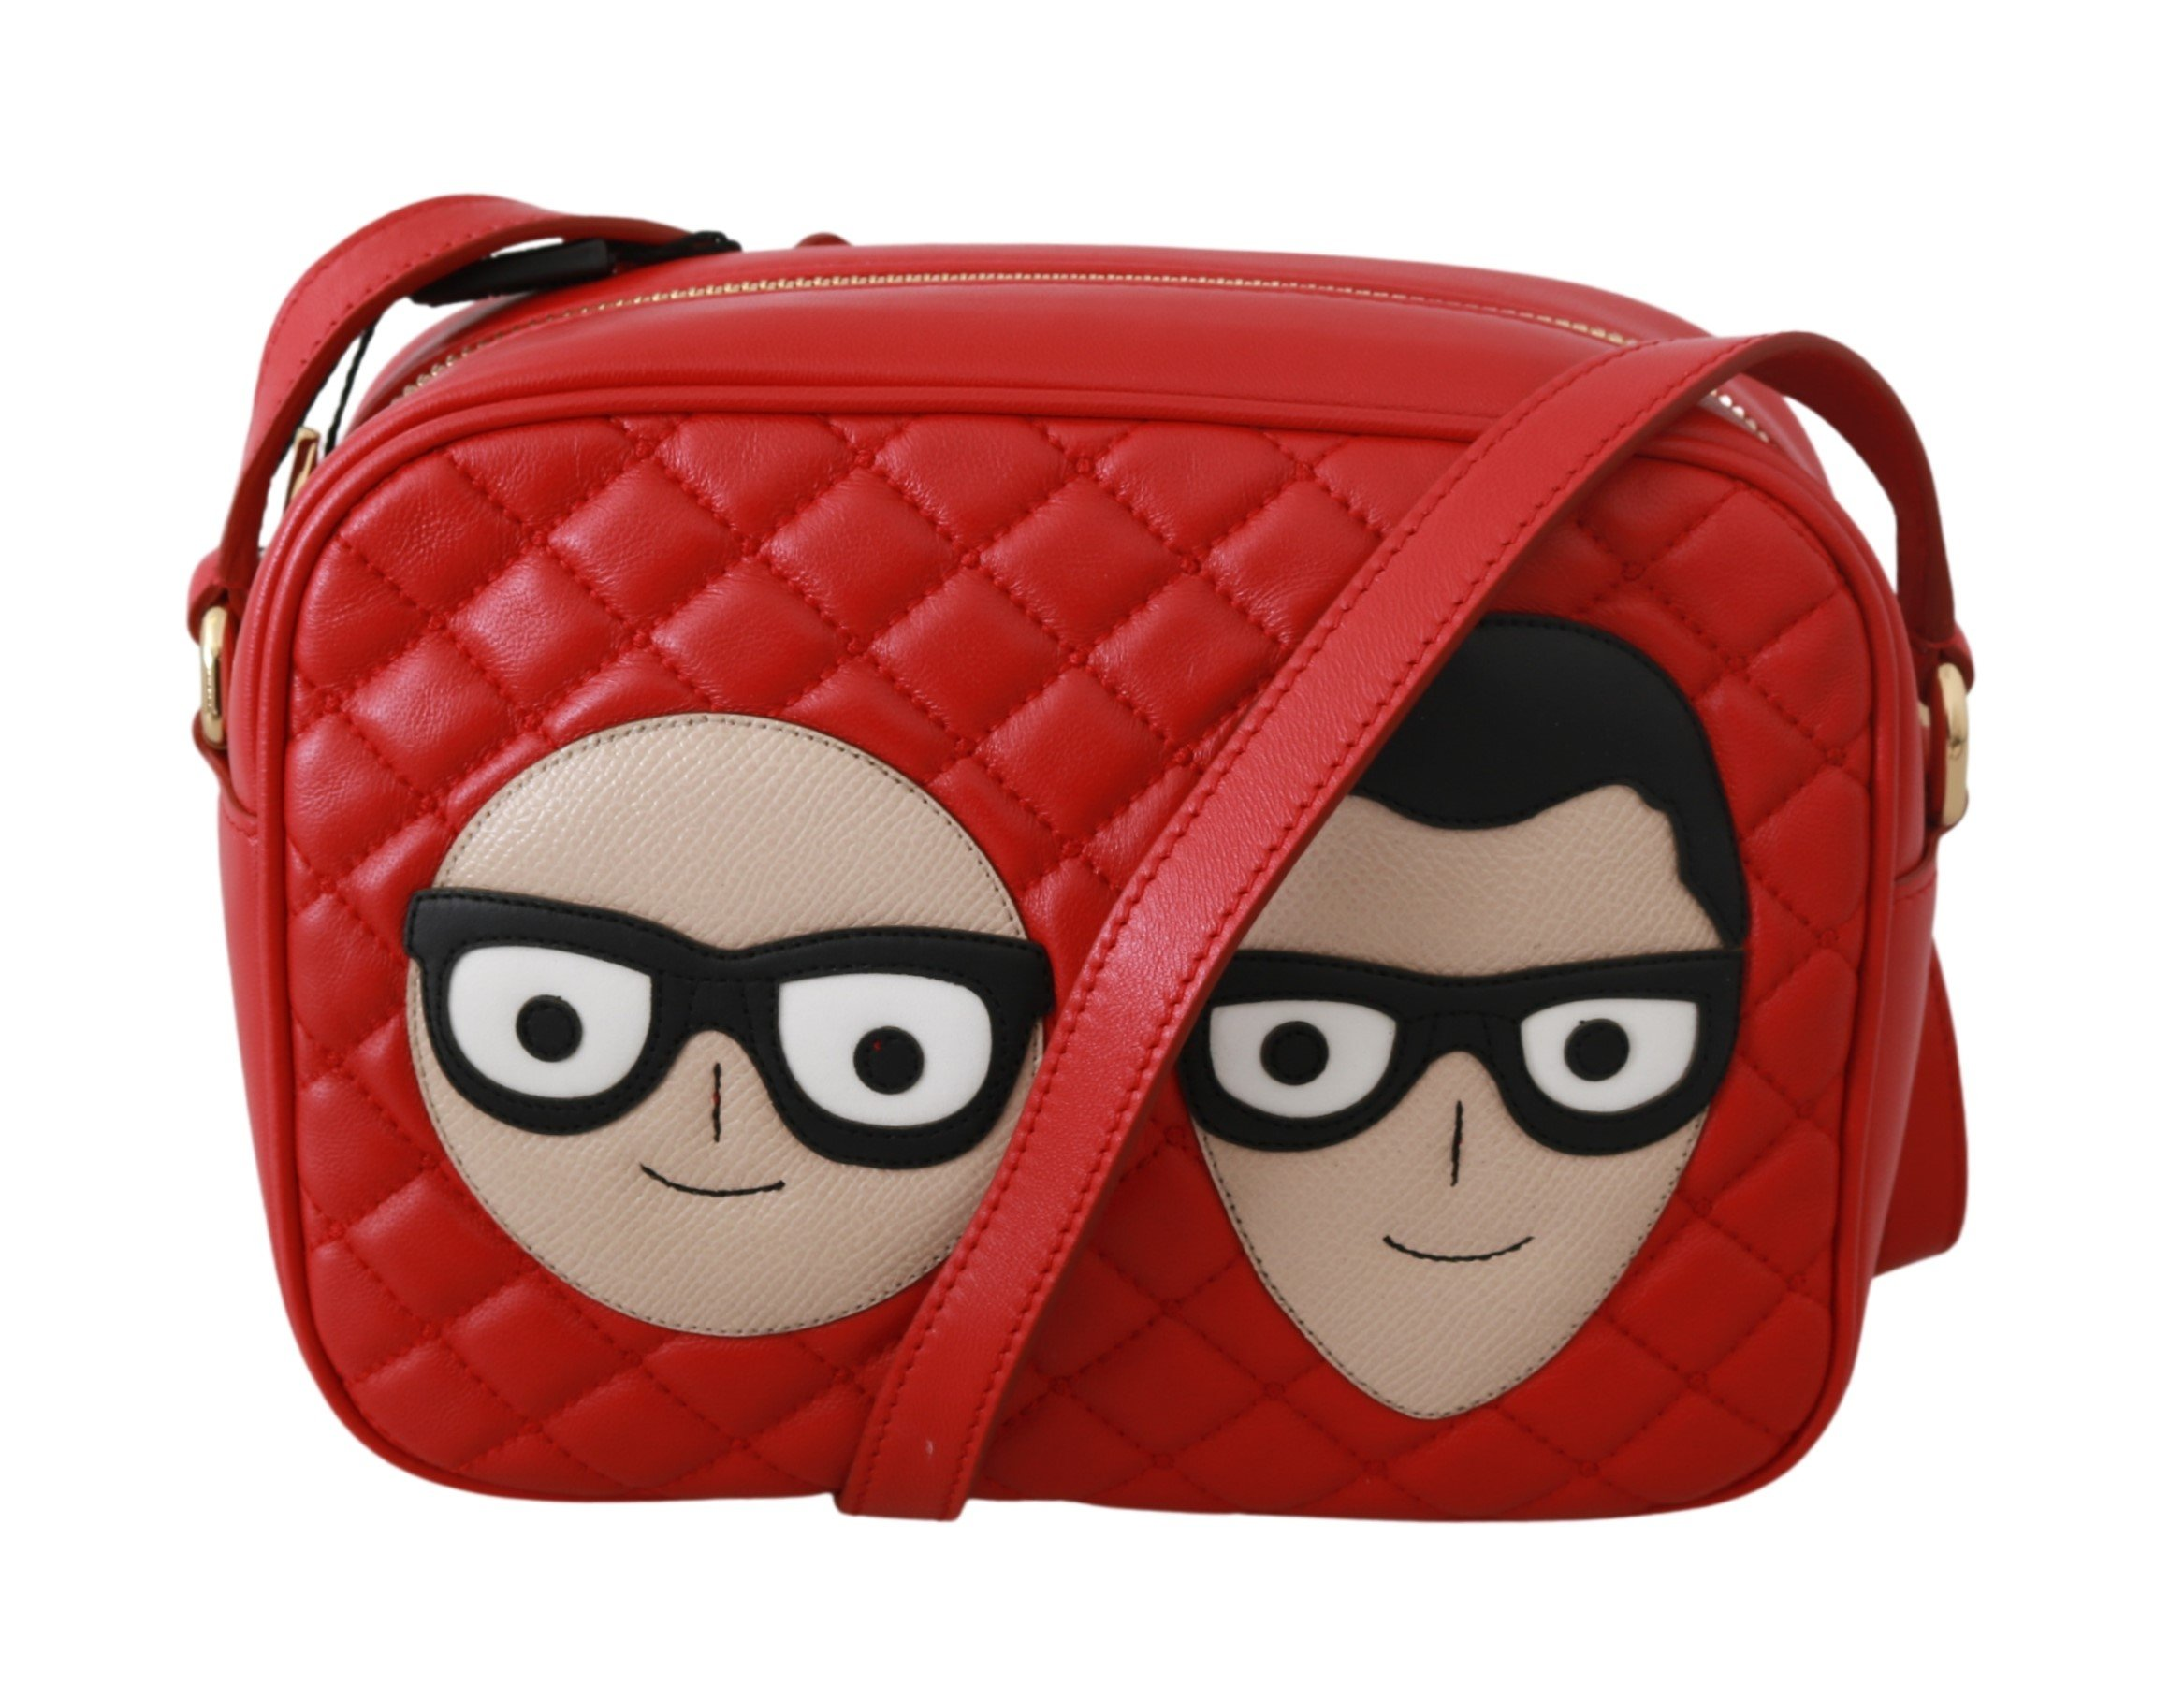 Dolce & Gabbana Women's Patch GLAM Leather Crossbody Bag Red VAS9213